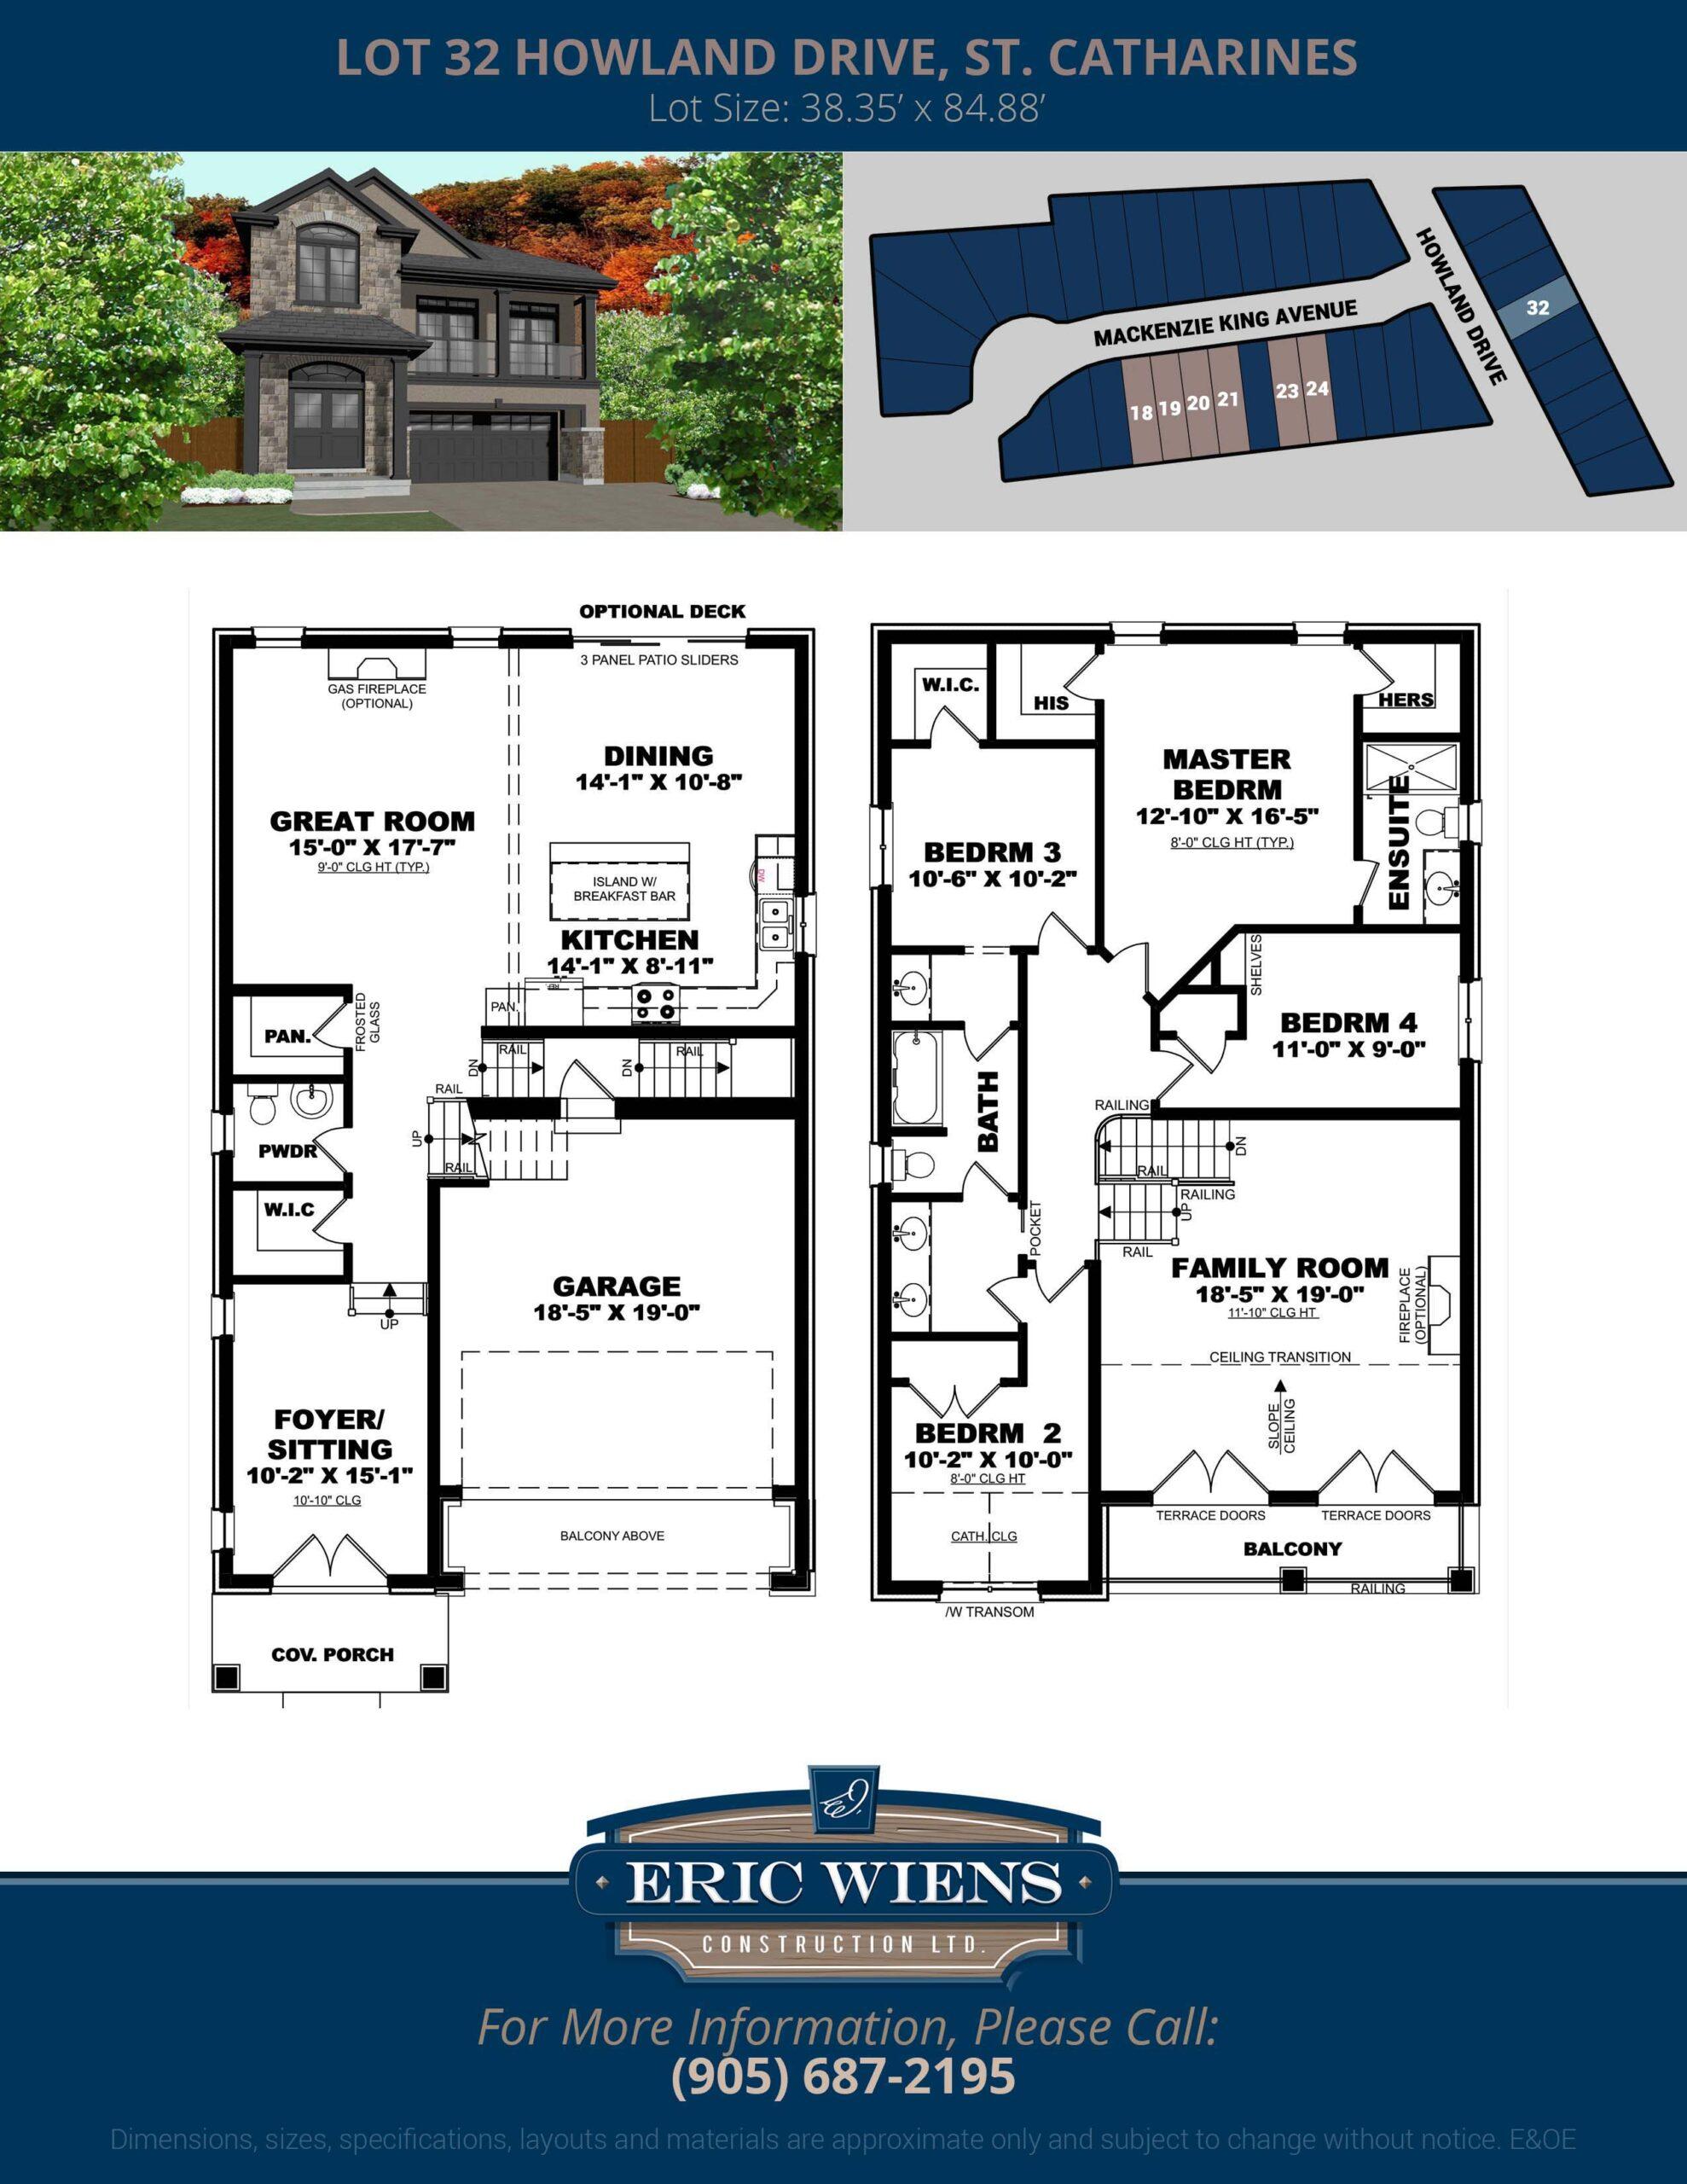 Lot 32 Howland Drive Floor Plan